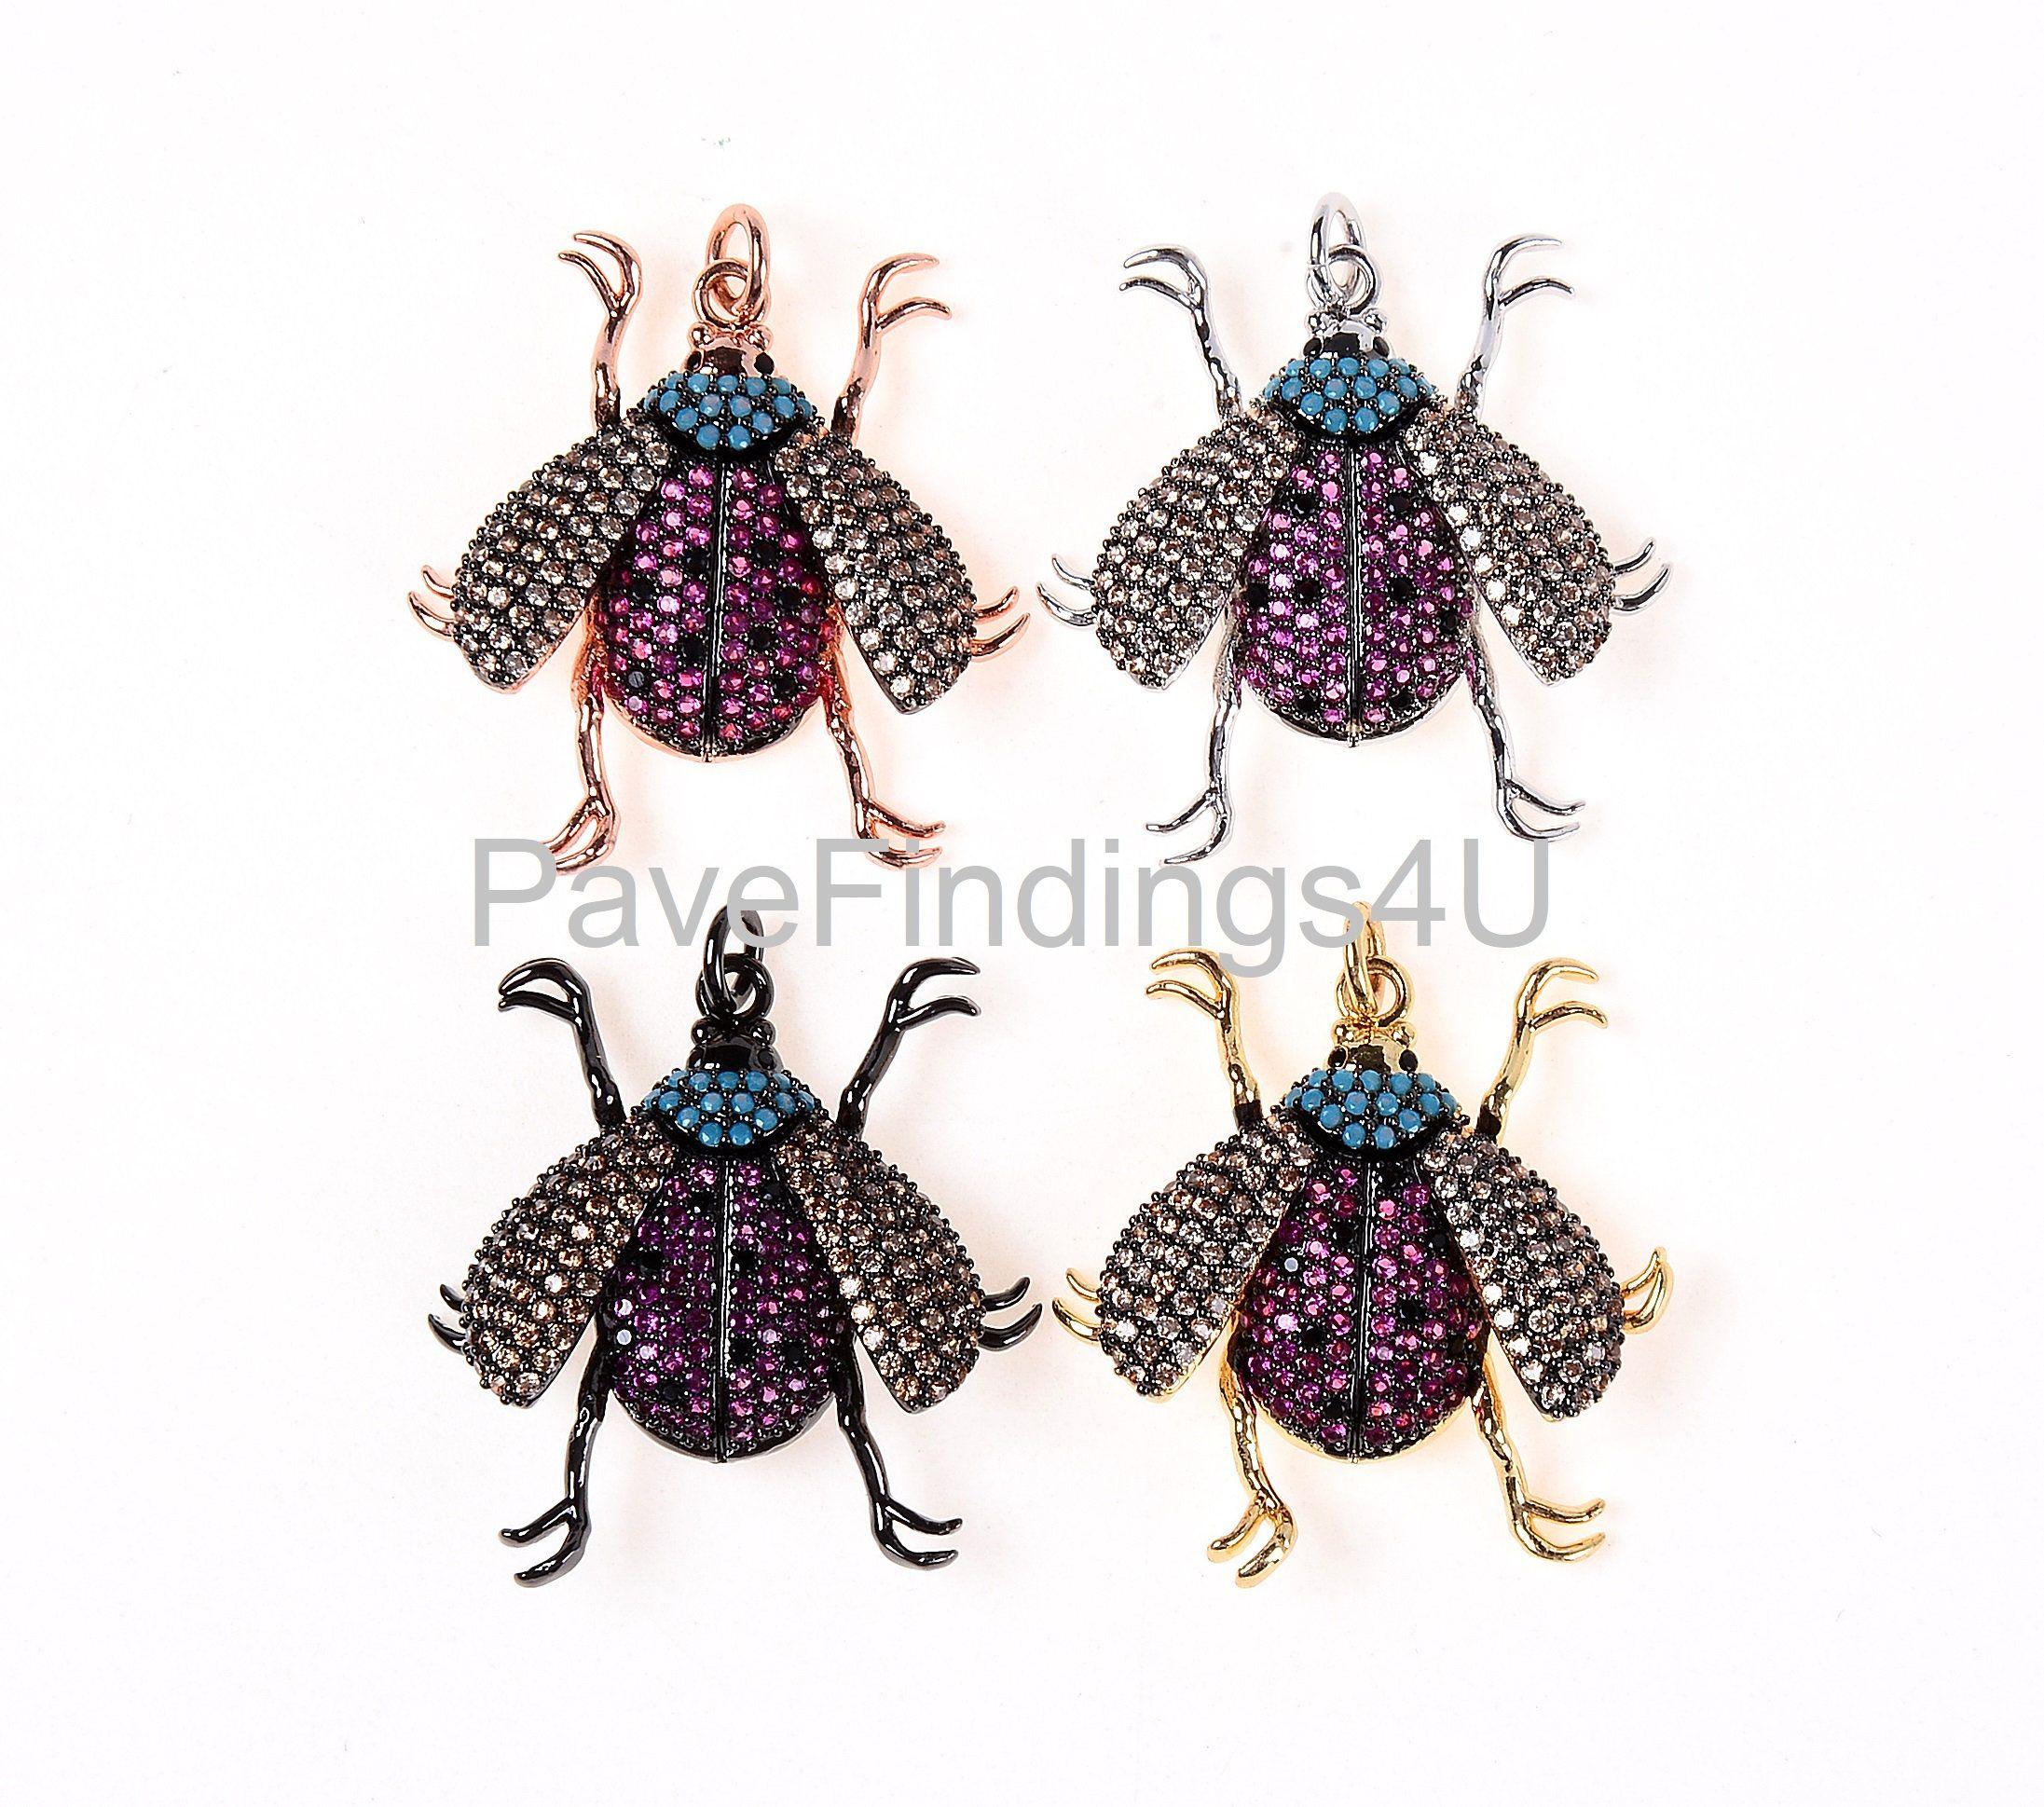 c84345217 Inspired LADYBUG Pendant, CZ Micro Pave LadyBug Charm, Ladybug/ Beetle/  Bugs Charm, Gold/ Rose Gold/ Silver/ Black Tone, 29X27MM|CP183A by  PaveFindings4u on ...